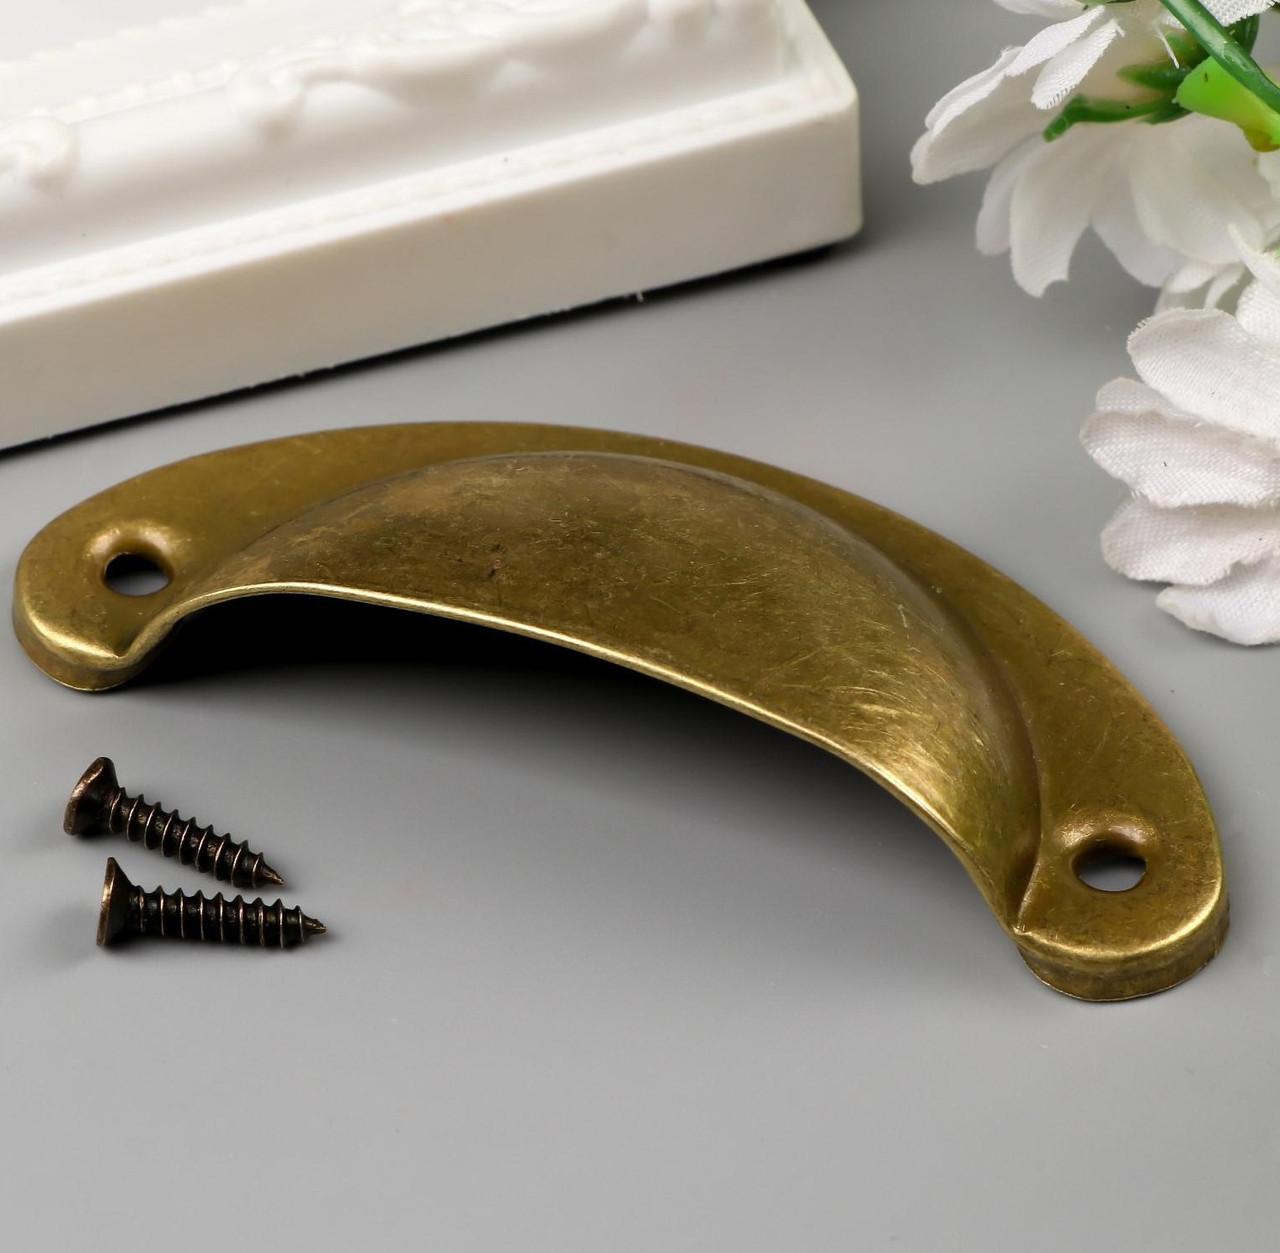 Ручка с шурупом, жёлтая бронза 3,5х8 см (5 штук)